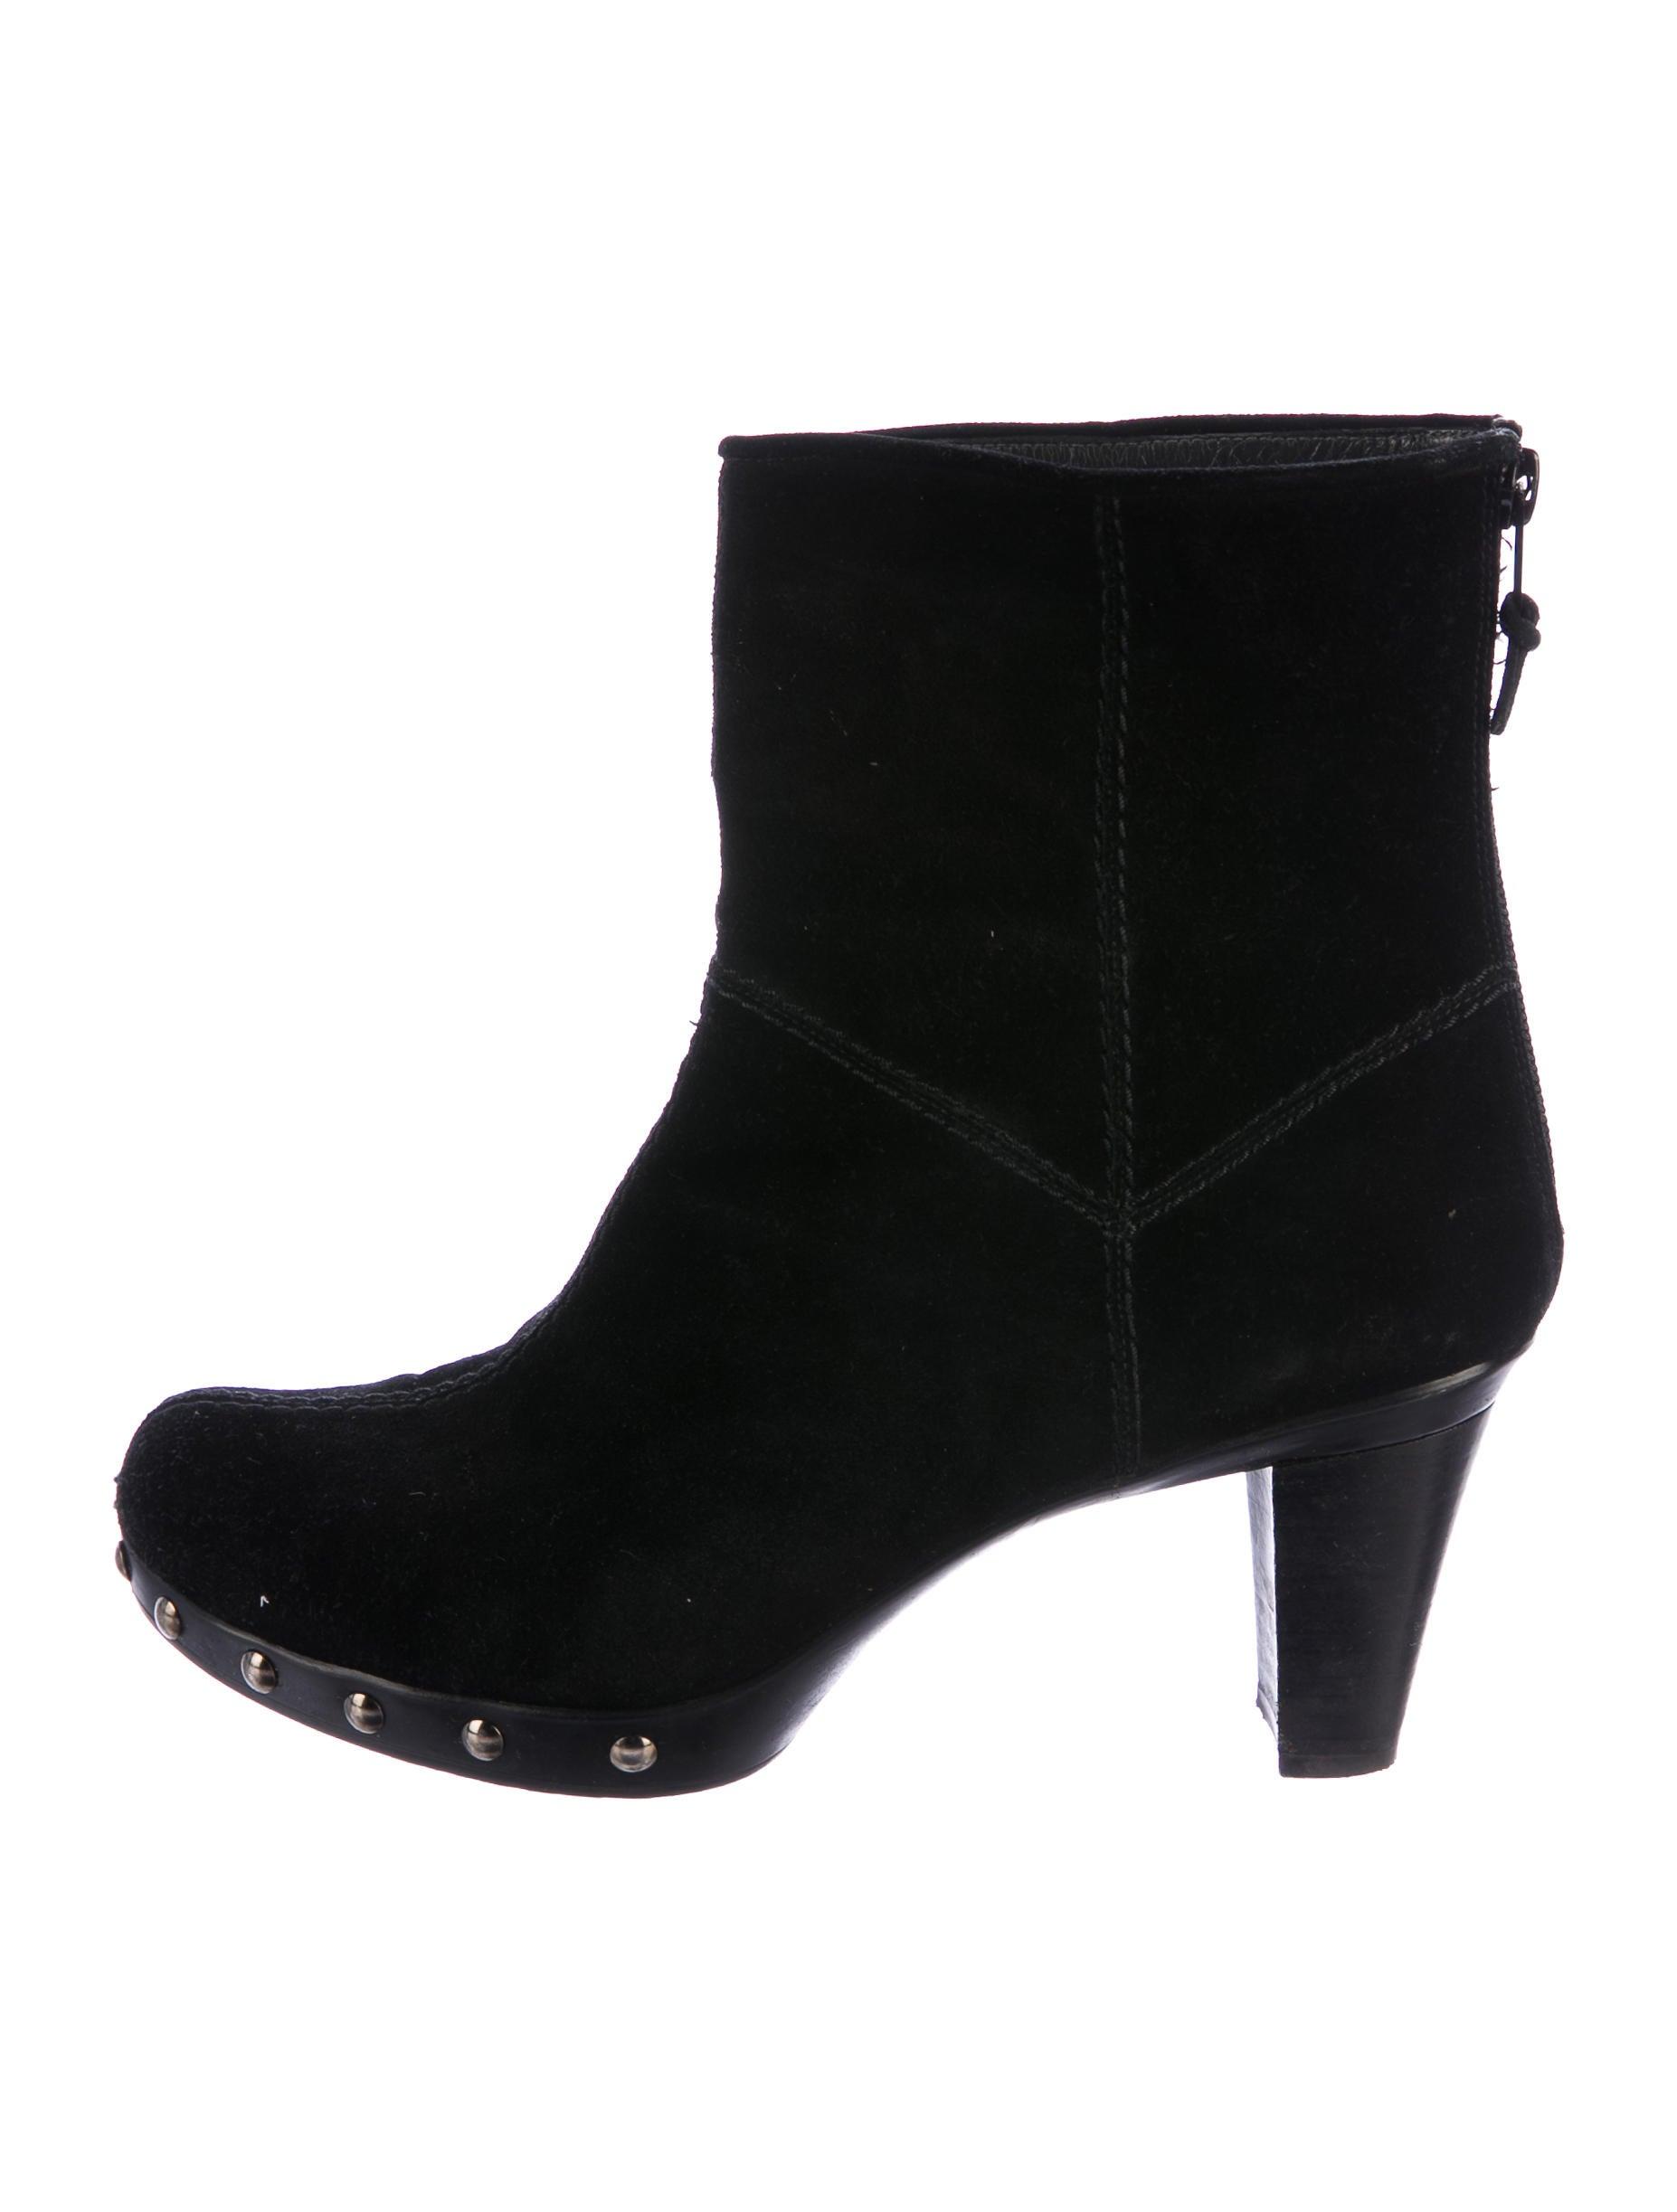 stuart weitzman toe suede ankle boots shoes